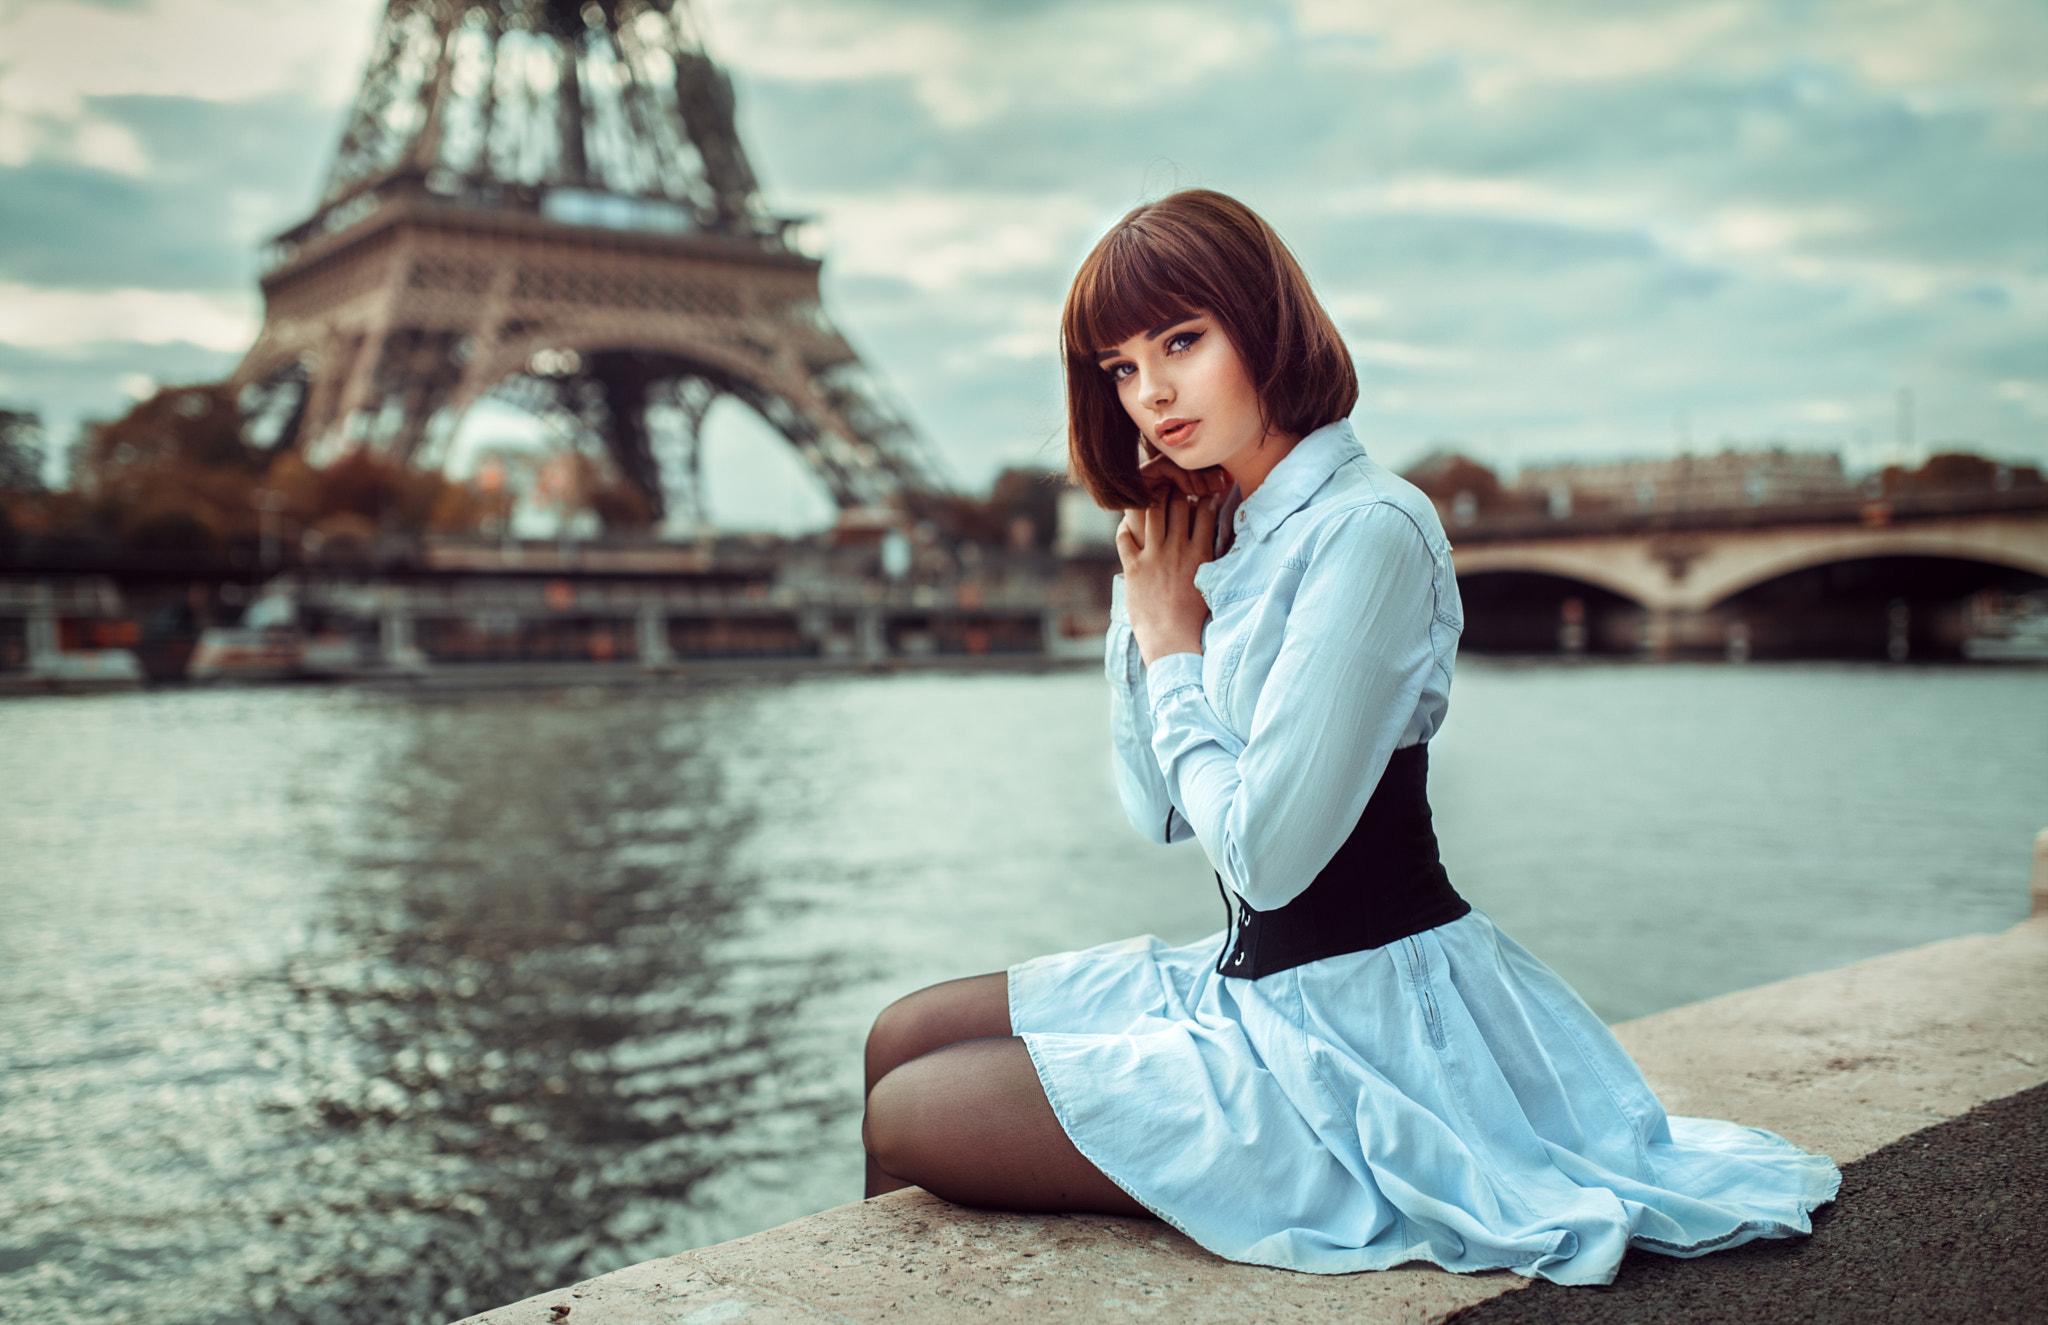 Wallpaper Women Portrait Lods Franck Brunette Open Mouth Blue Dress Sitting Paris Eiffel Tower Seine Looking At Viewer Corset Marie Grippon Panty Hose 2048x1325 Venom 1212215 Hd Wallpapers Wallhere